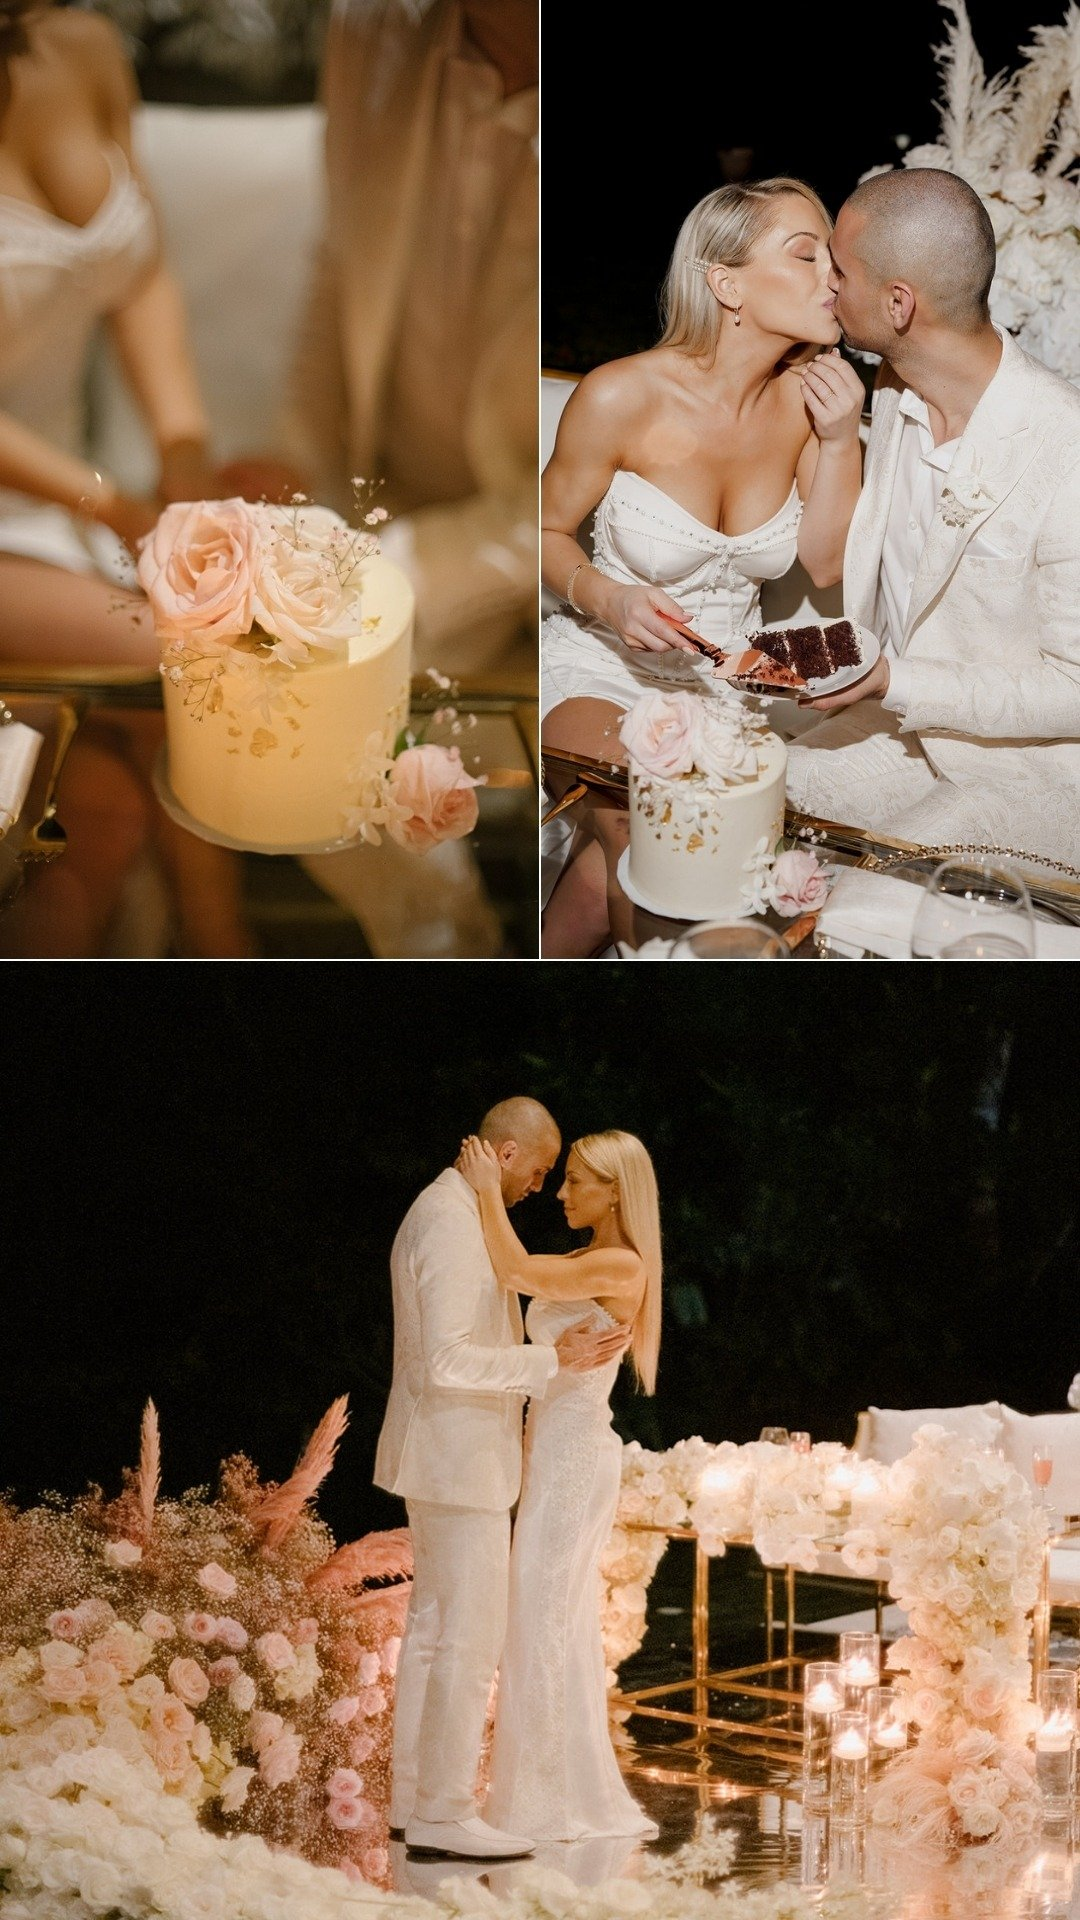 wedding cake elopement costa rica